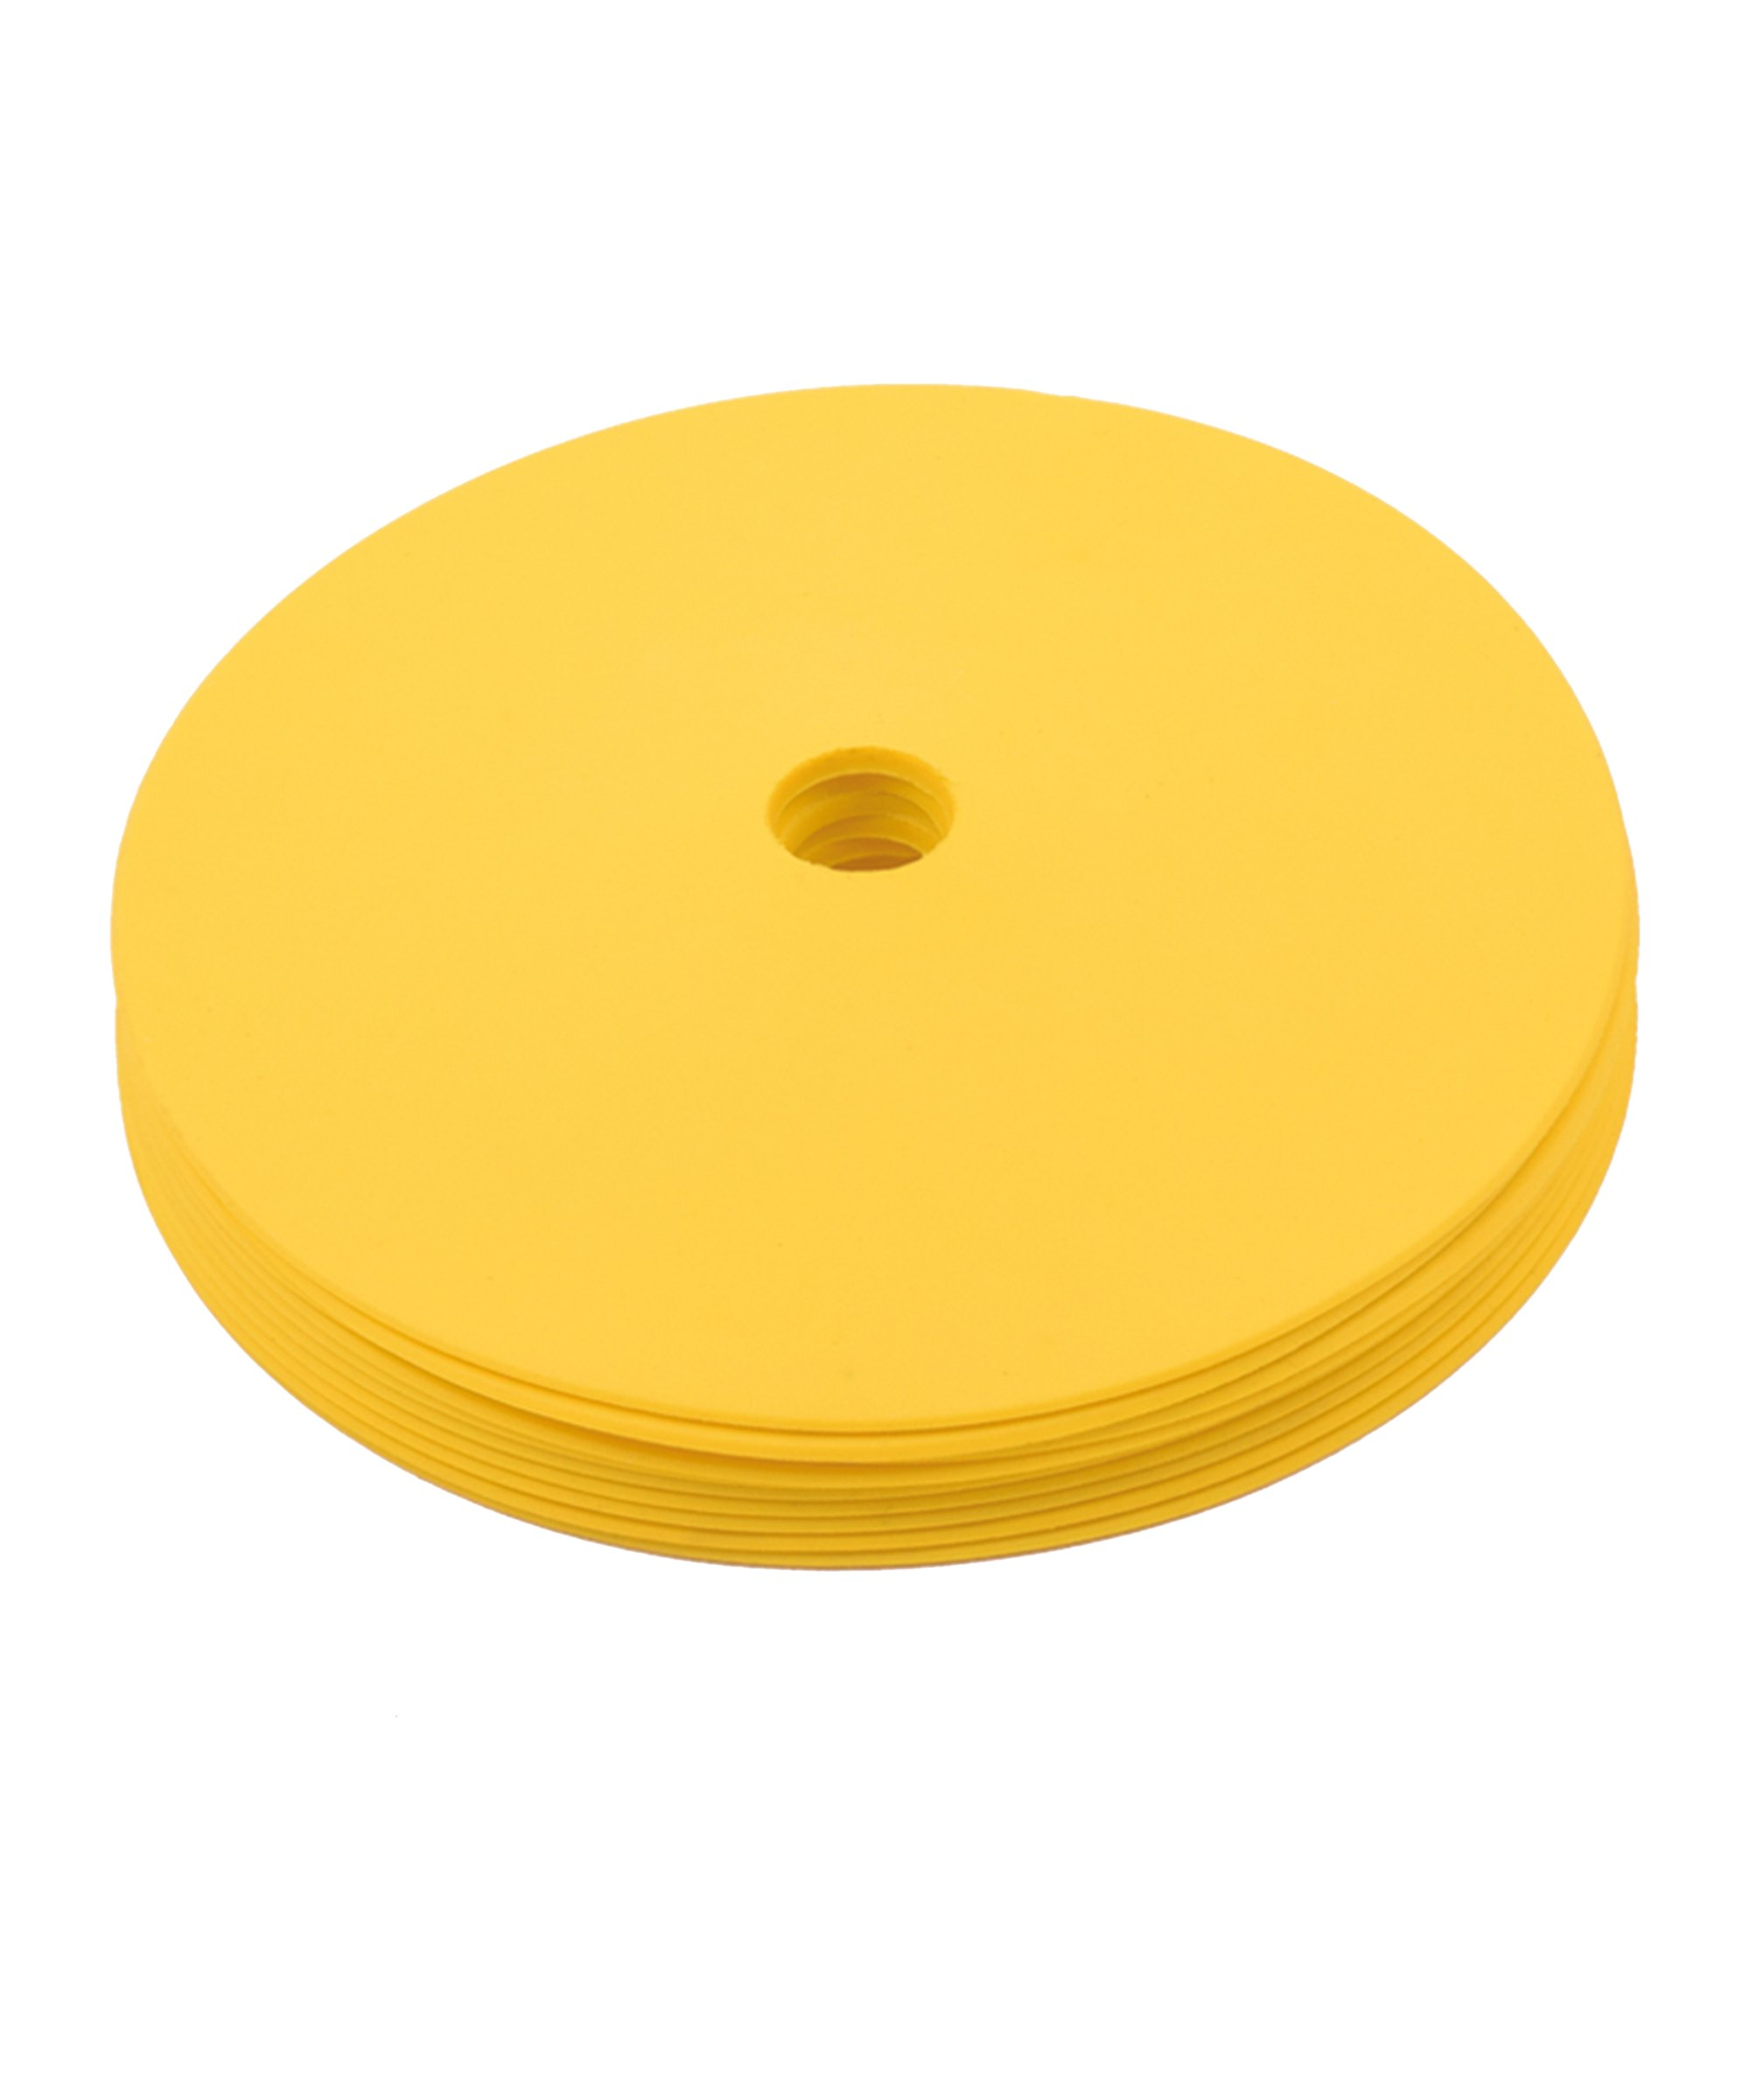 Cawila PRO TRAINING Floormark 10er Set d15mm Gelb - gelb